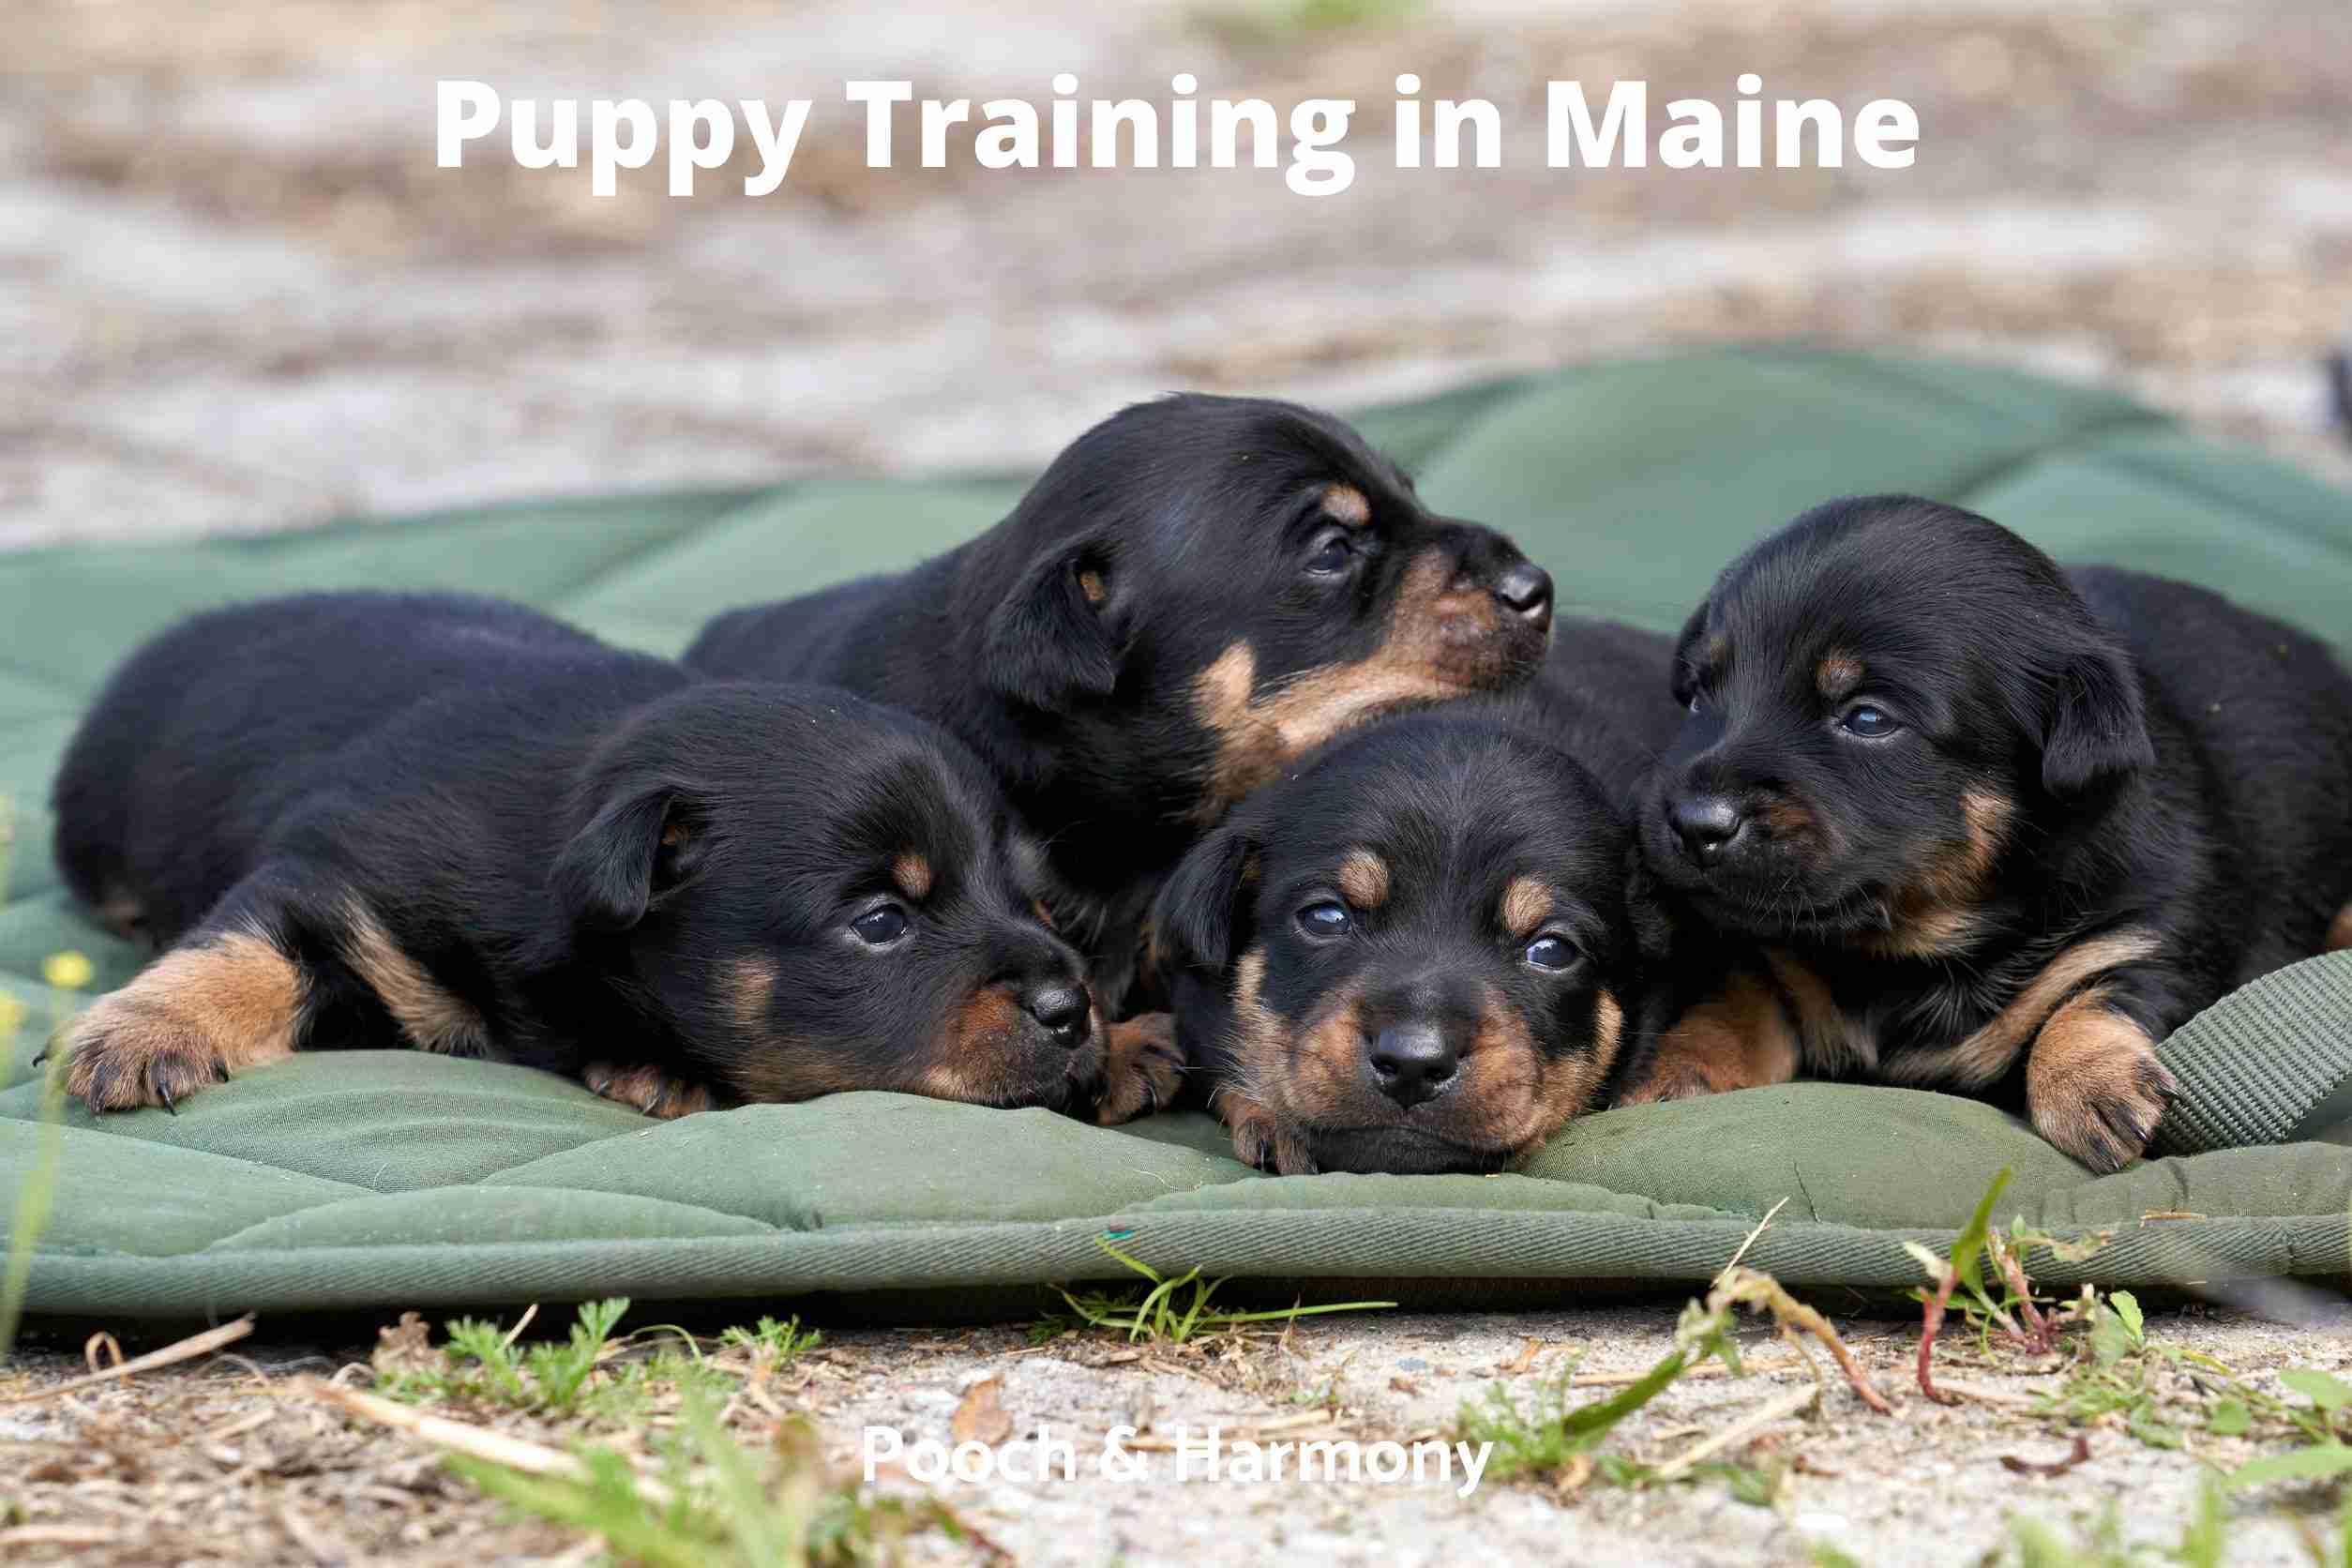 Puppy Training in Maine